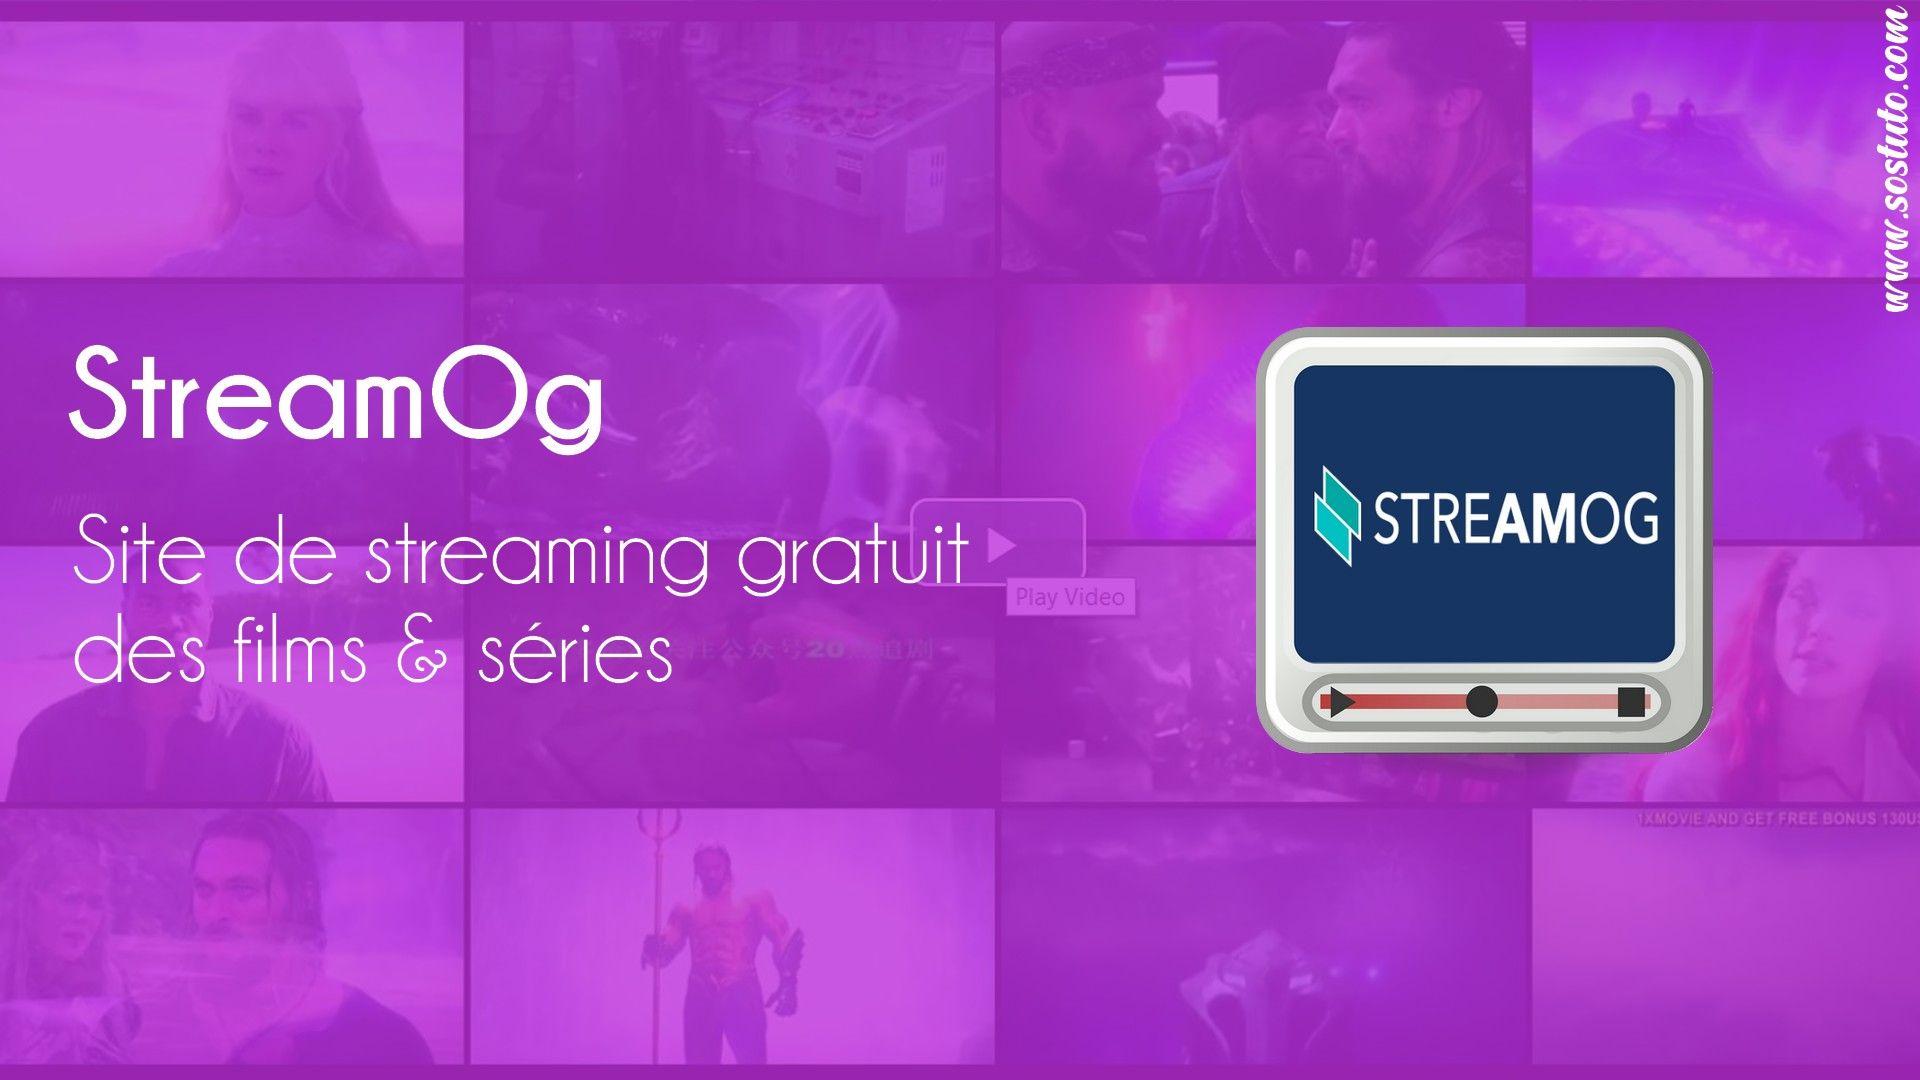 streamog.to  Comment Regarder un Film Complet en streaming – Streamog Avis